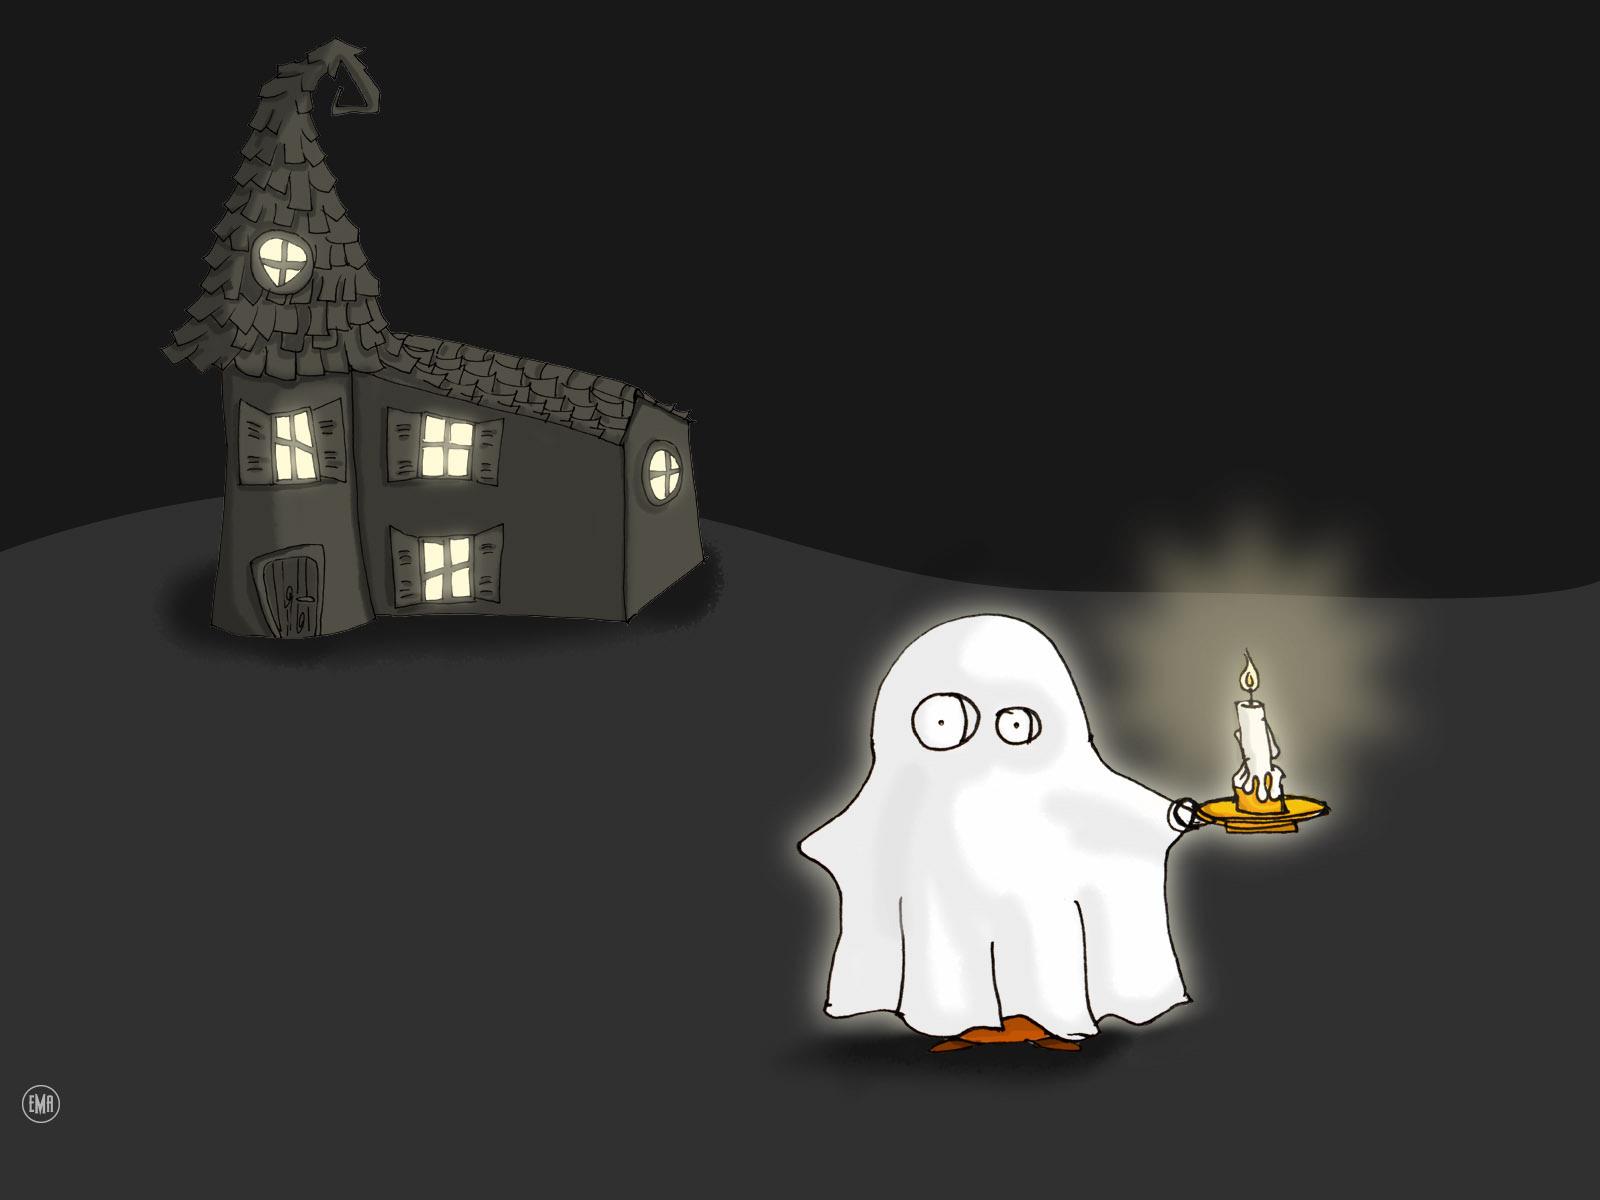 Cartoon Ghost Wallpaper Cartoon Images 1600x1200